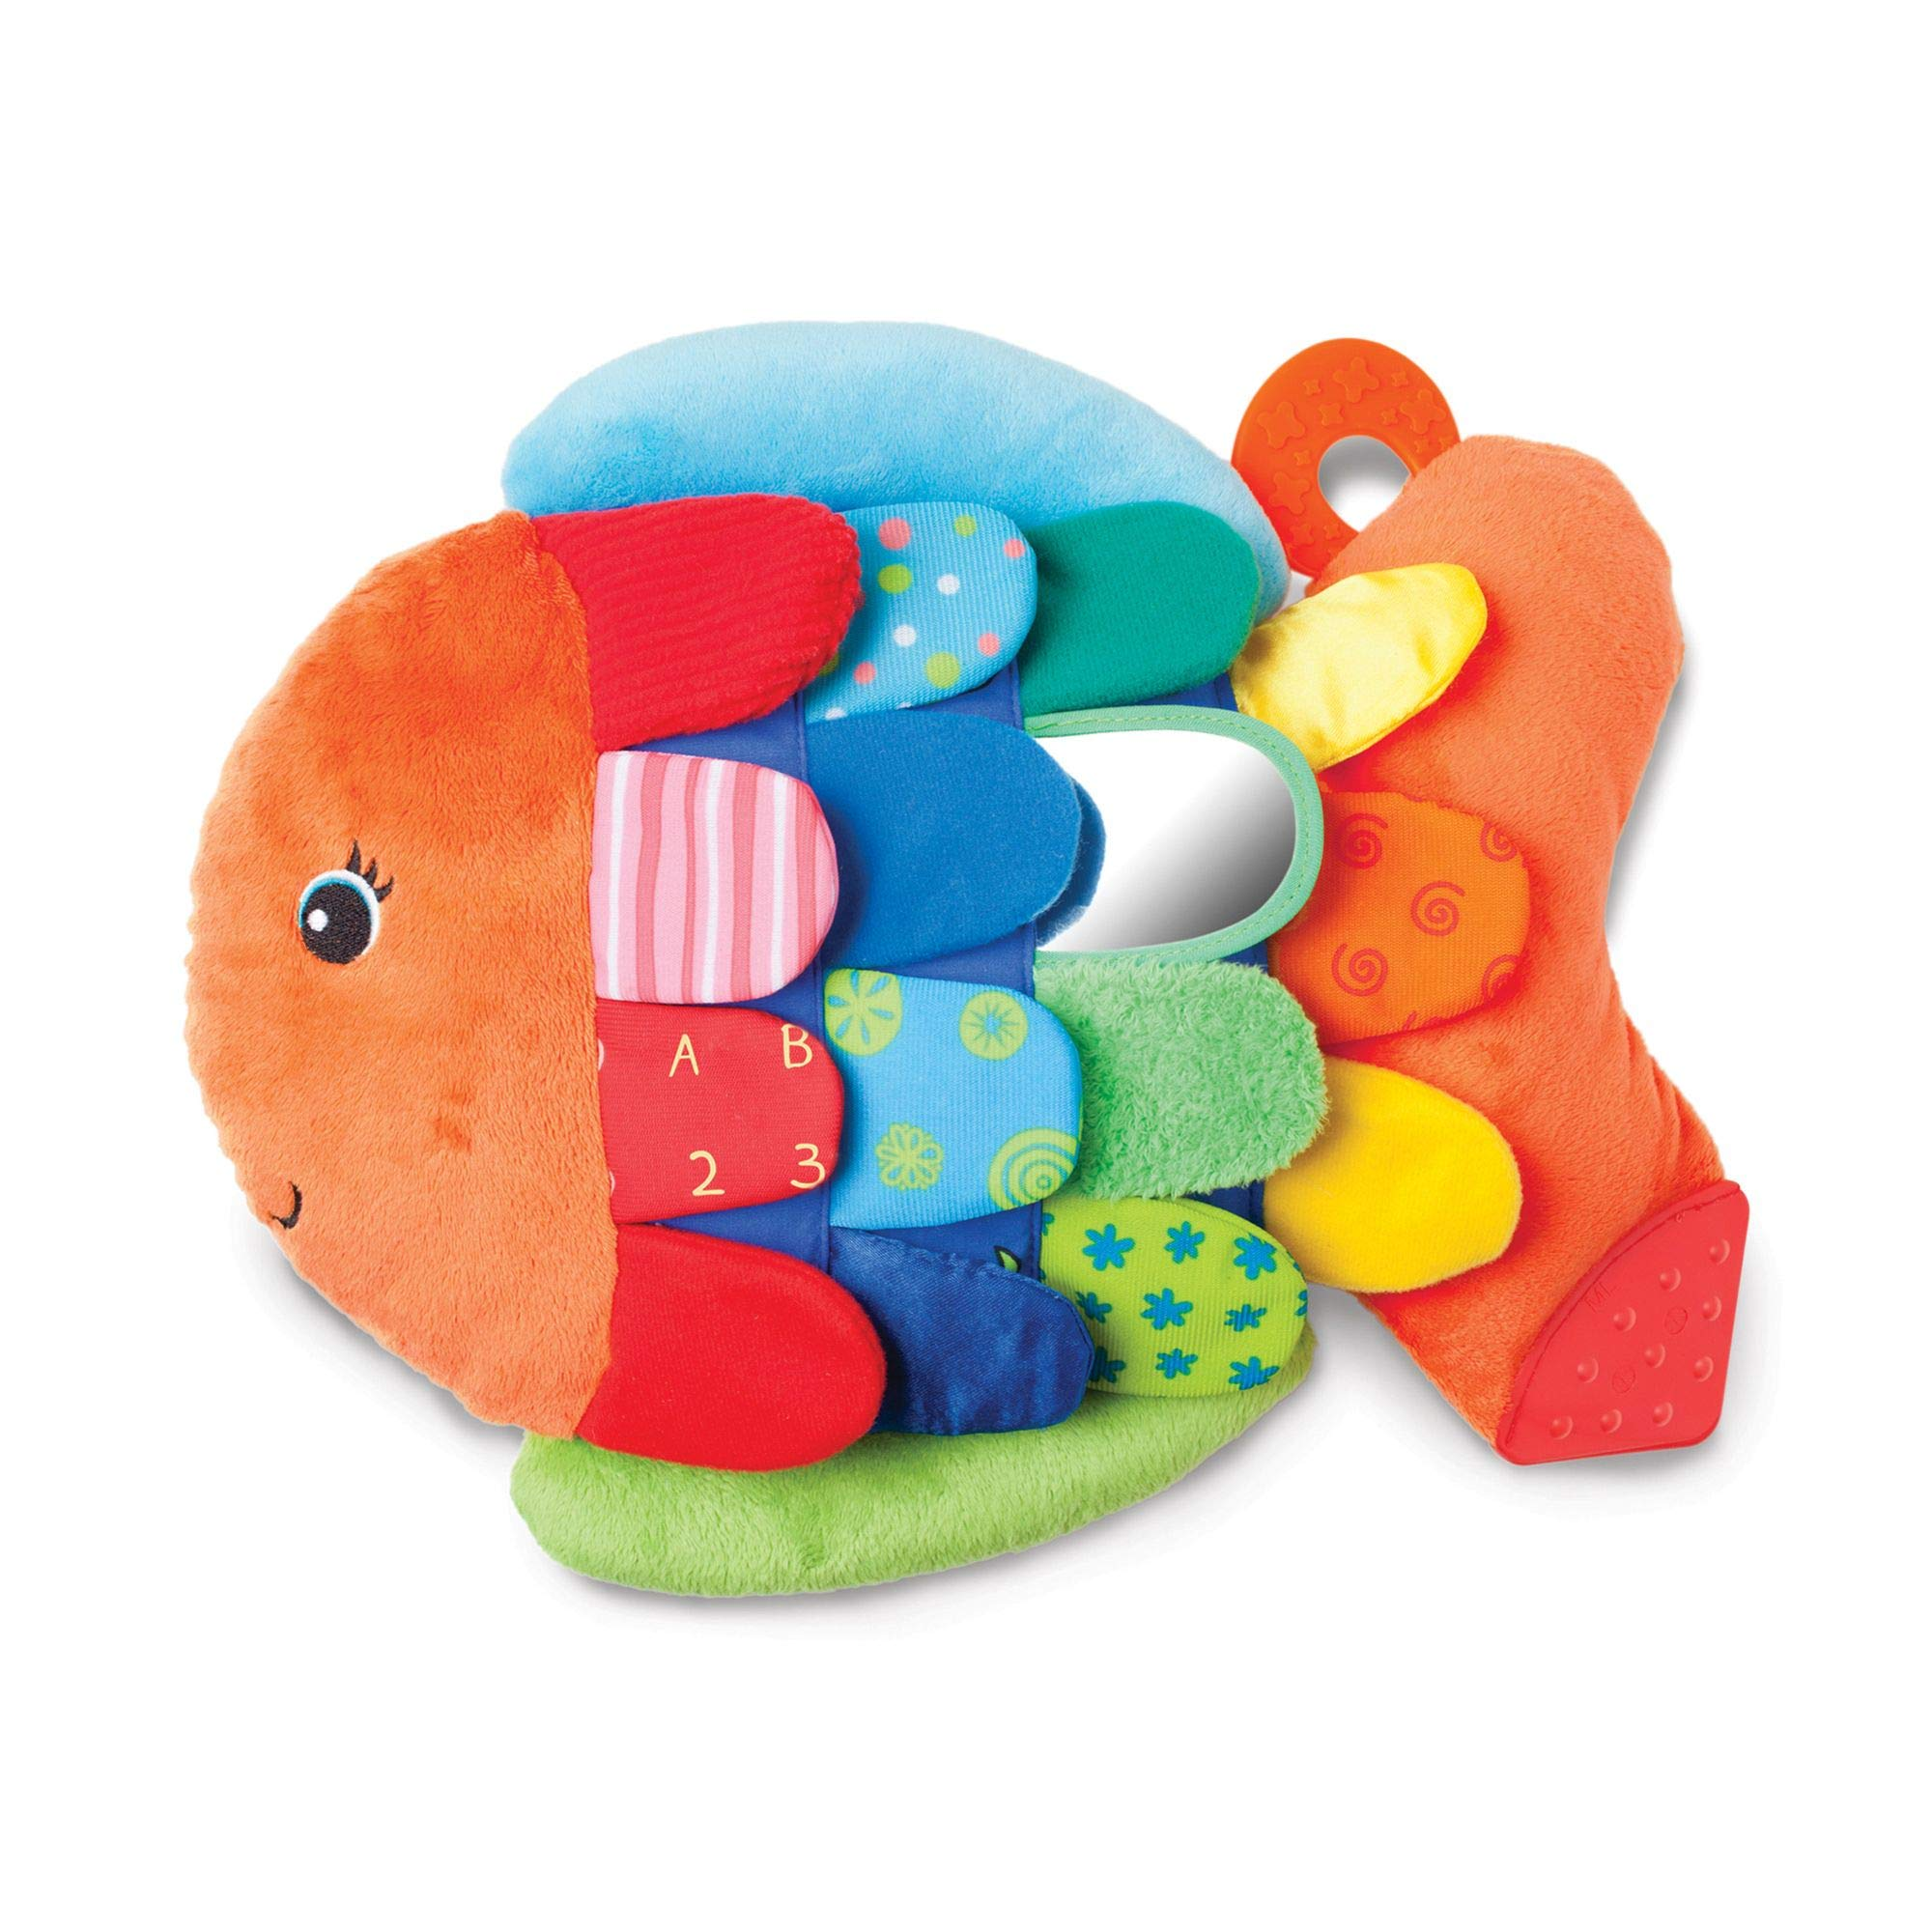 "Melissa & Doug Flip Fish Baby Toy, Developmental Toy, Squeaker Tail, Shatterproof Mirror, Washable Fabrics, 9.75"" H x 13"" W x 4"" L"